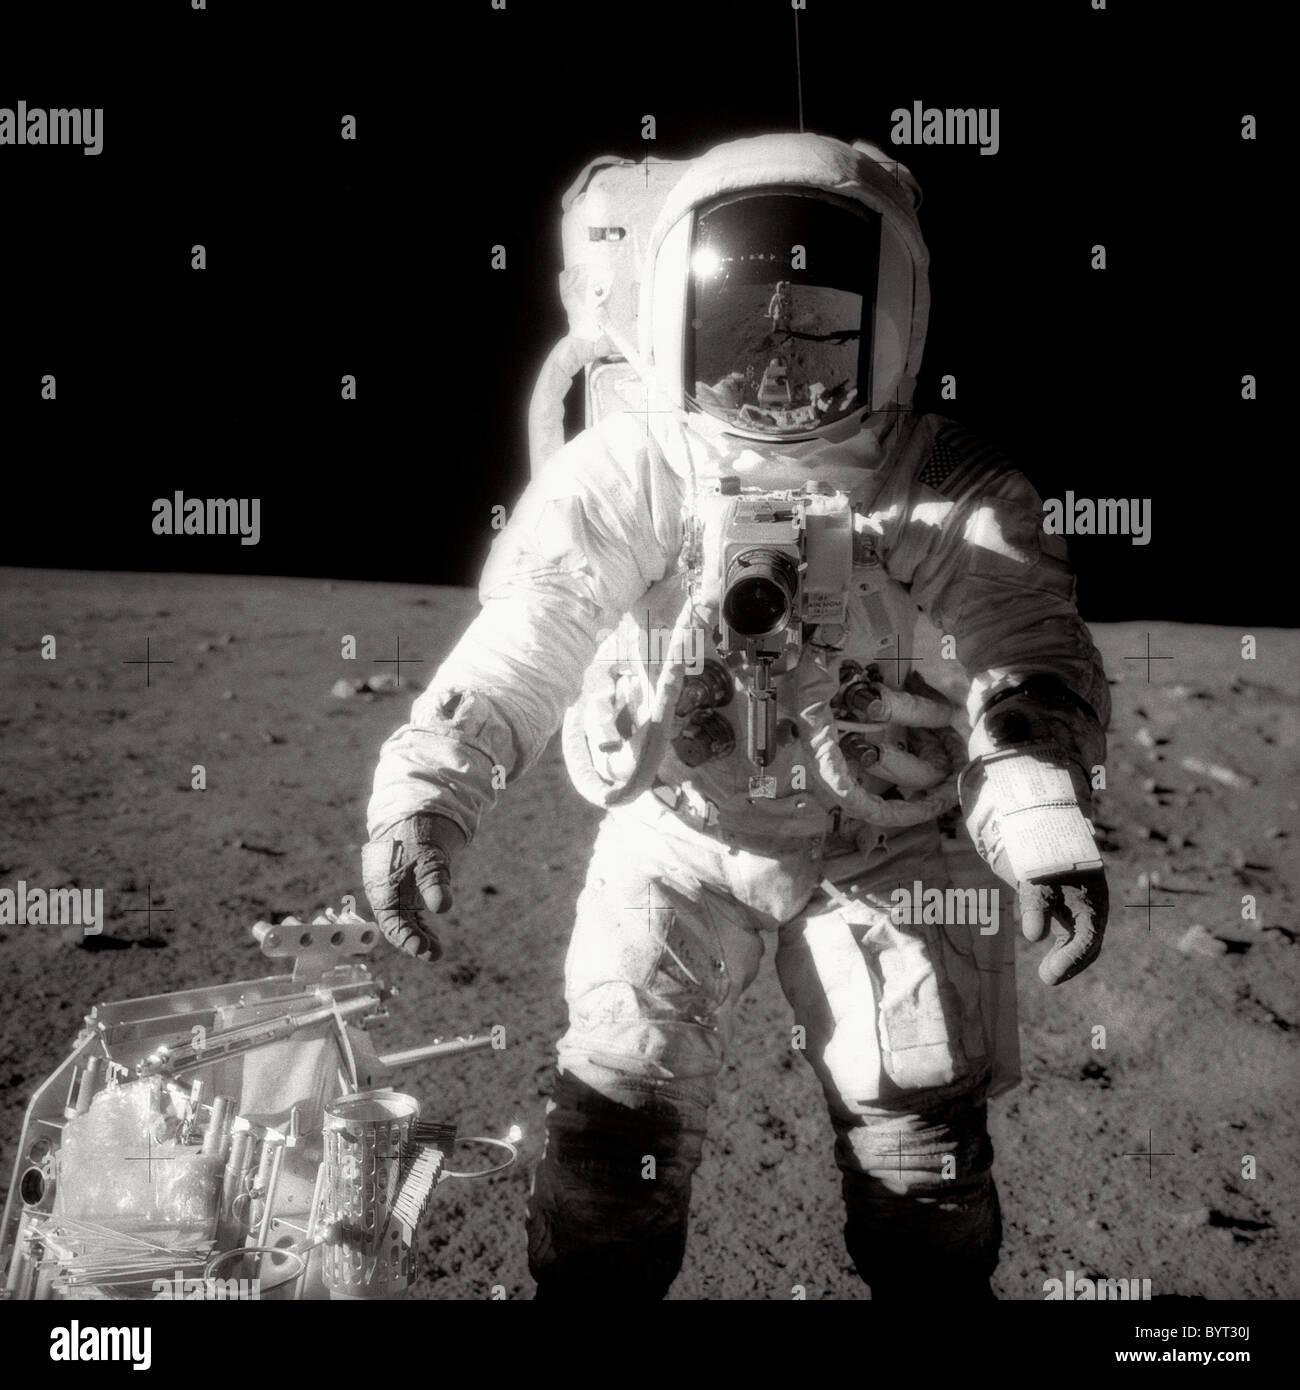 Apollo 12 Astronaut Alan L. Bean on the moon. - Stock Image